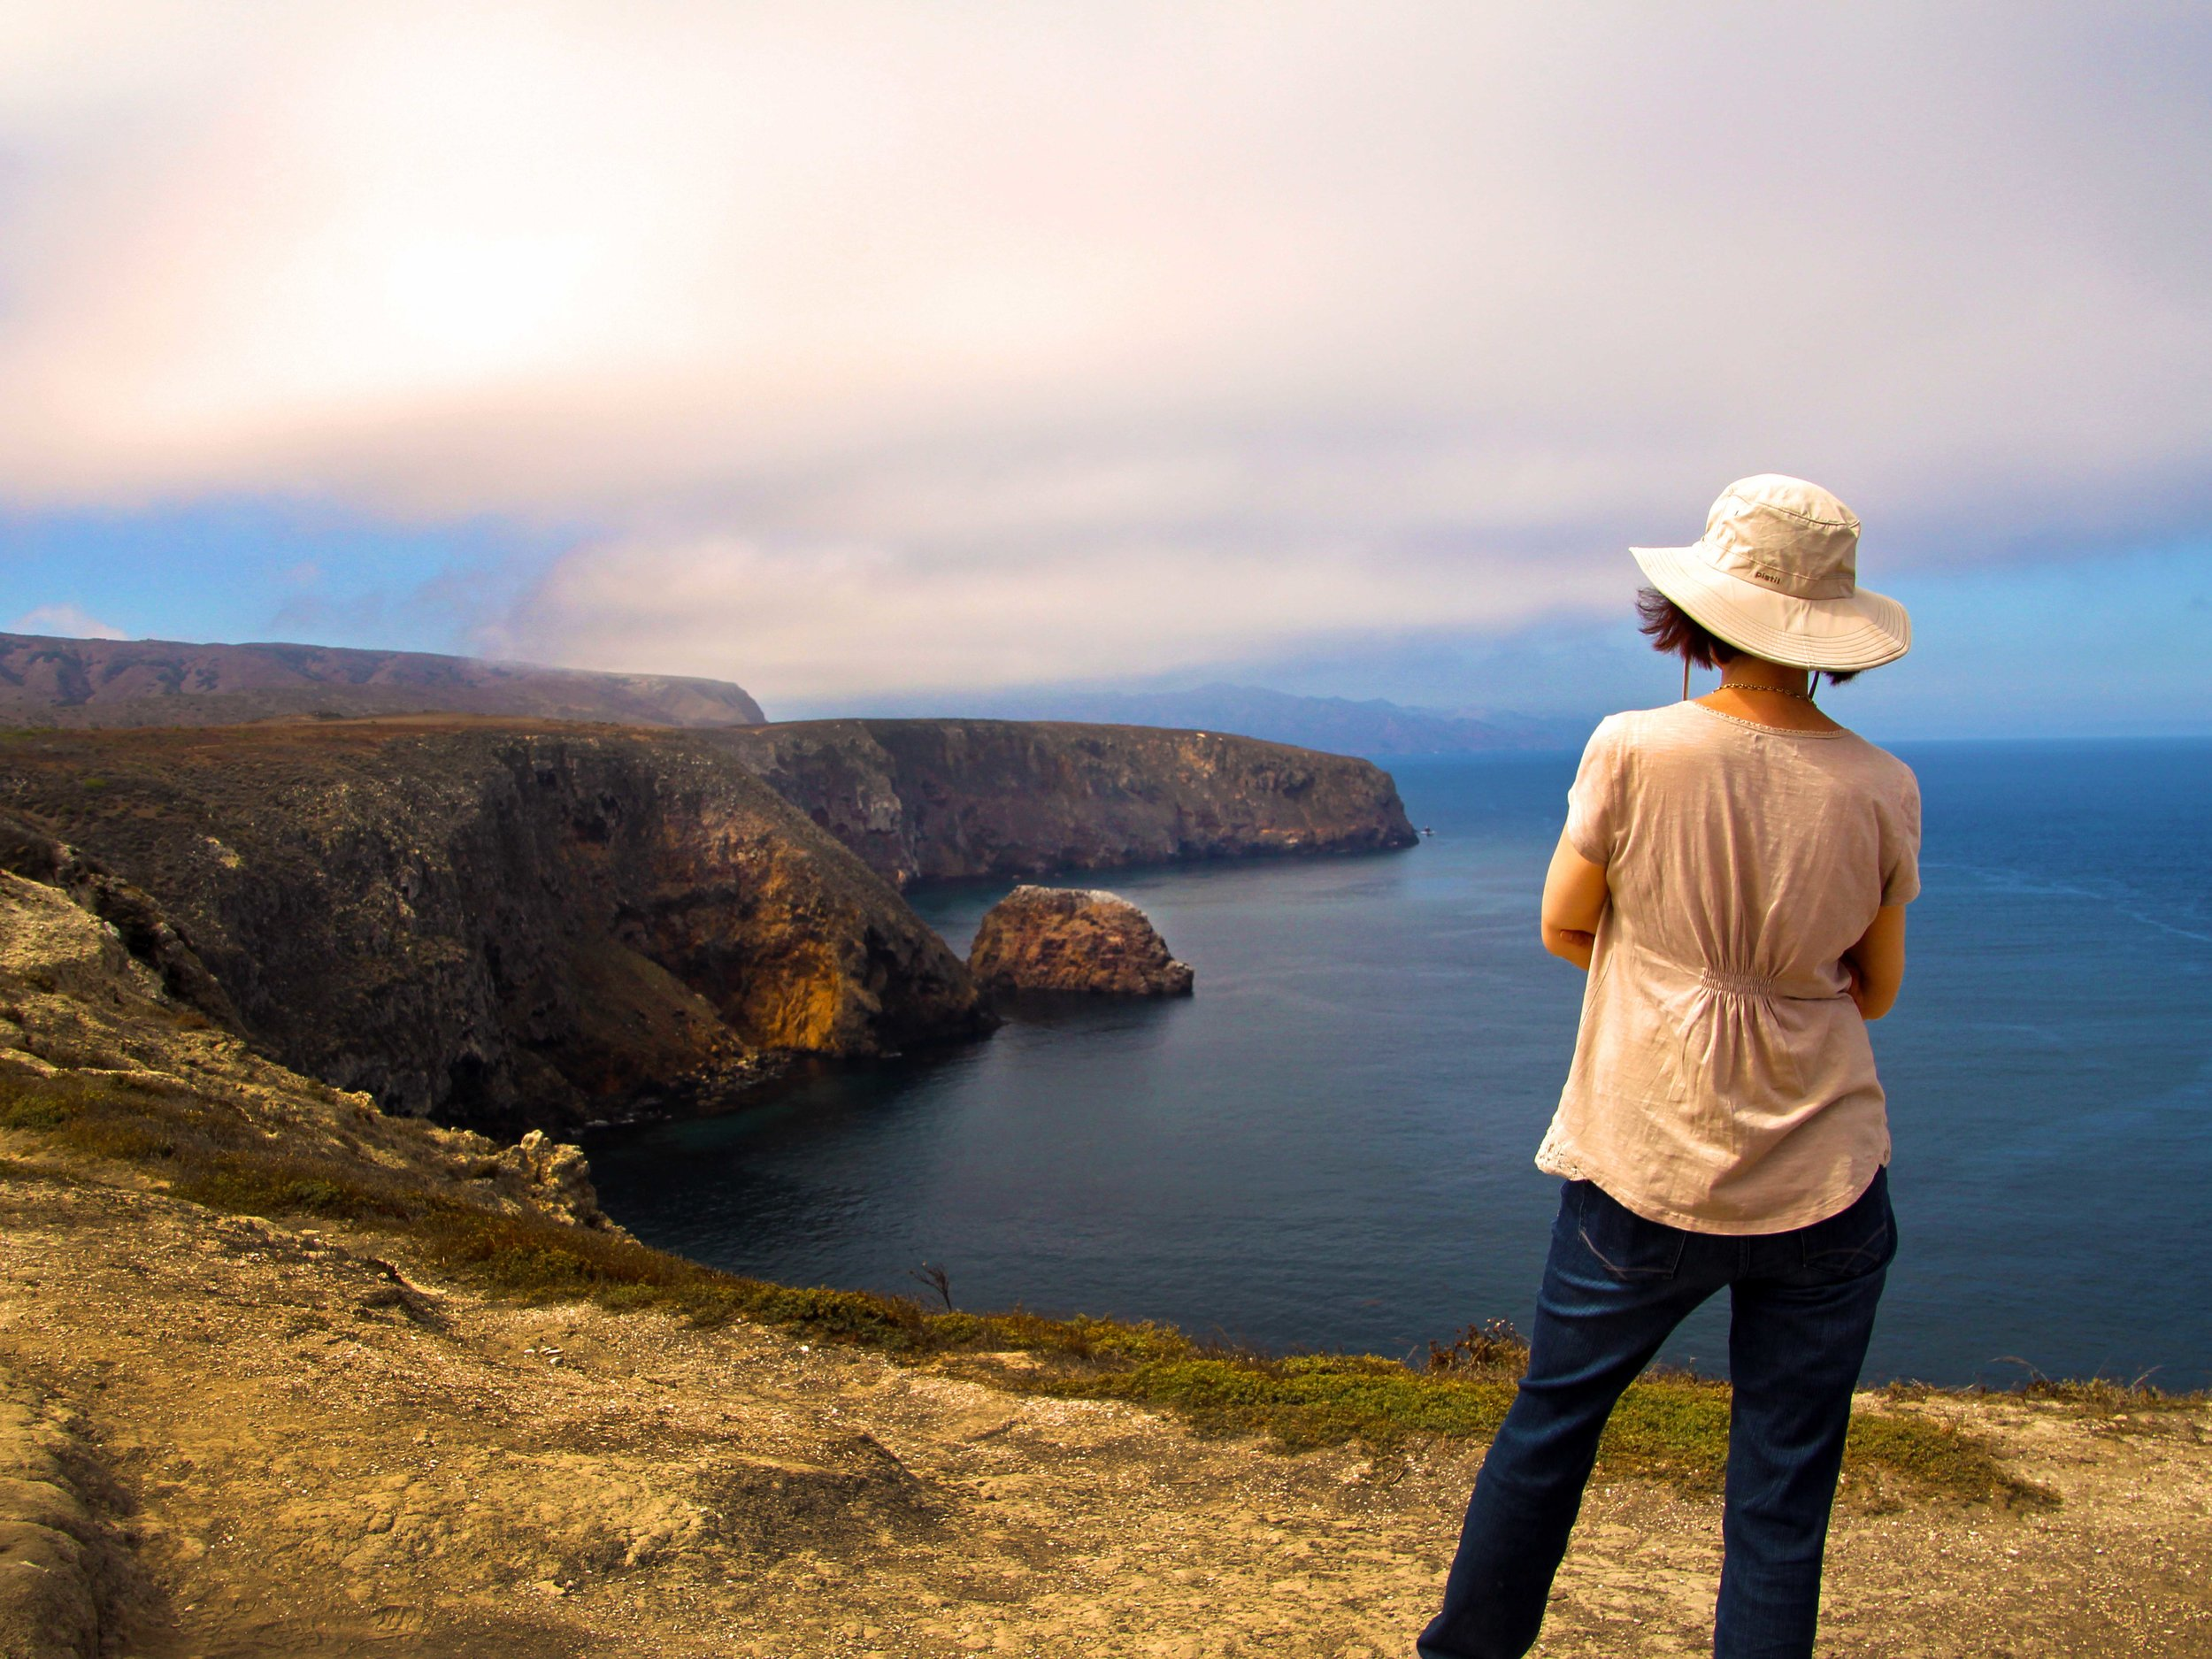 Santa Cruz, Channel Islands National Park, View on Cavern Point  © Joanne DiBona